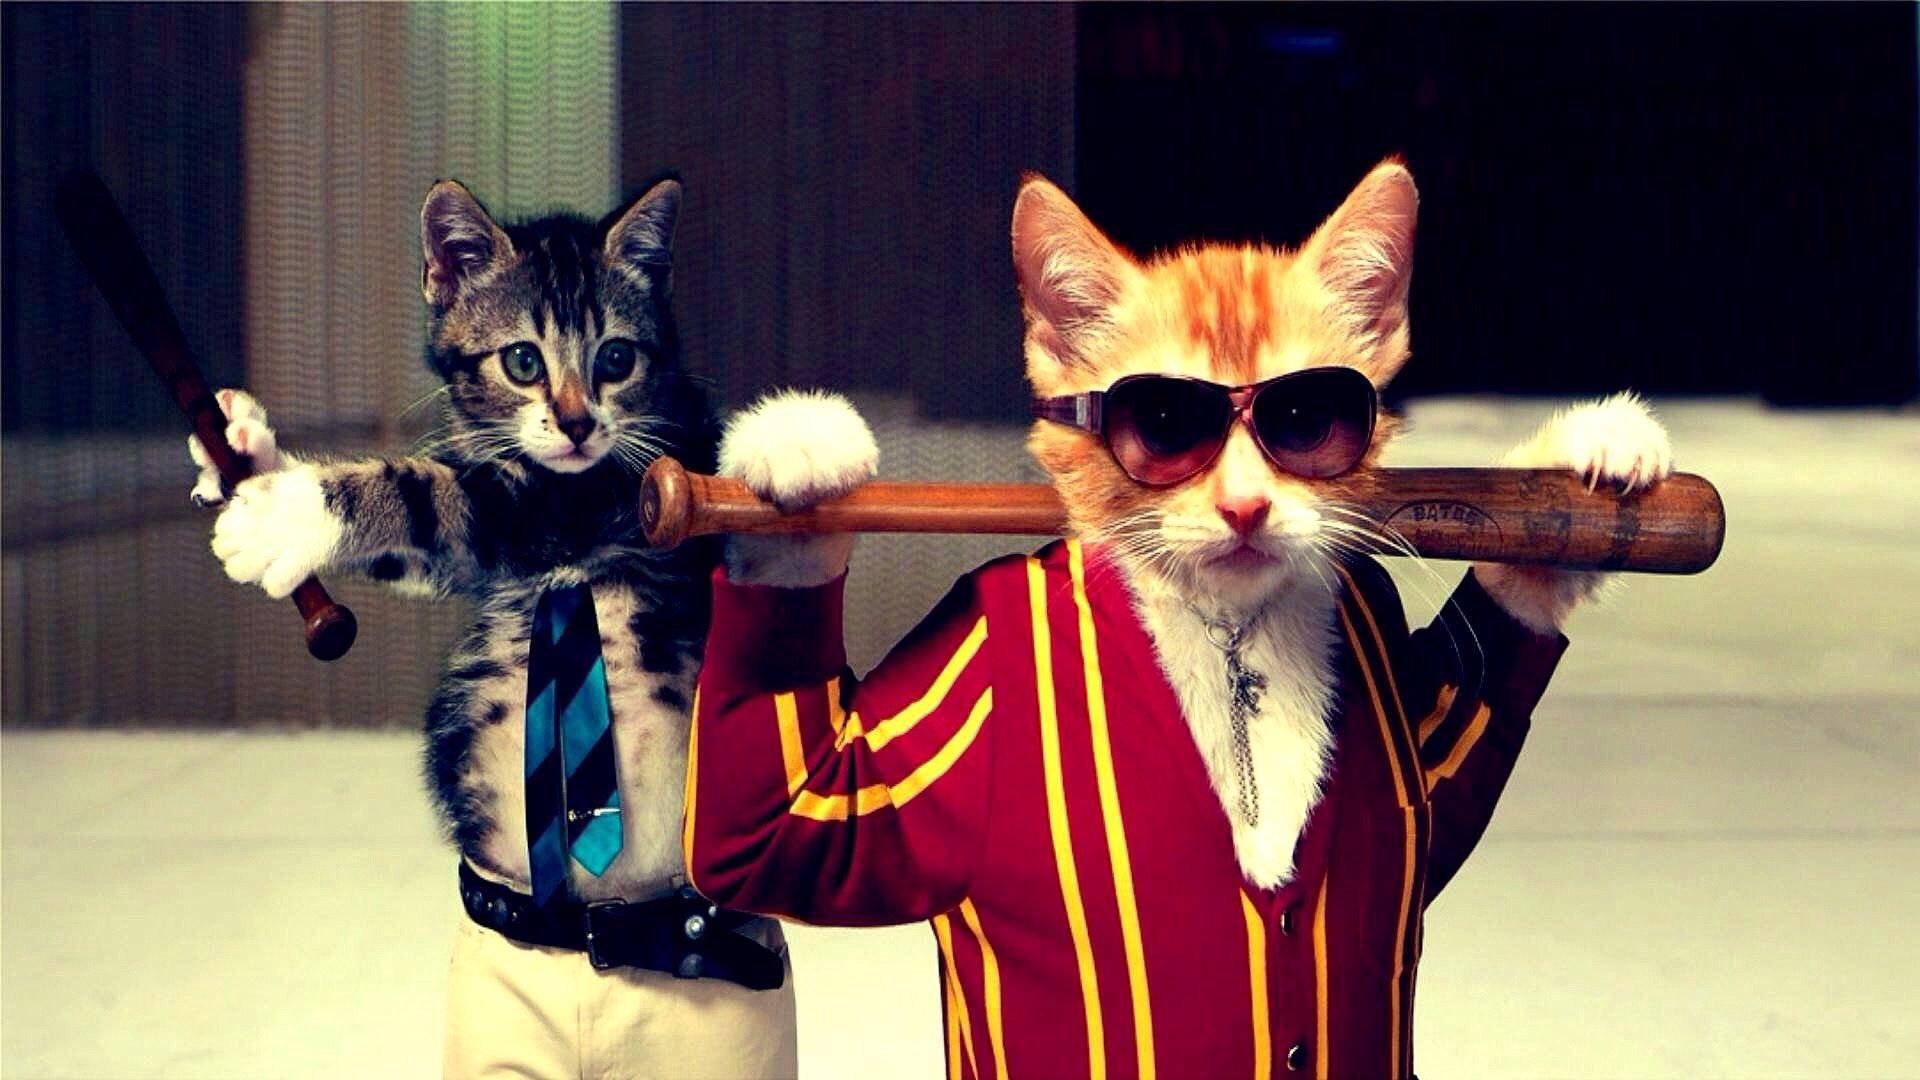 Cats wearing clothes \u0026 carrying Baseball Bats tough guys art